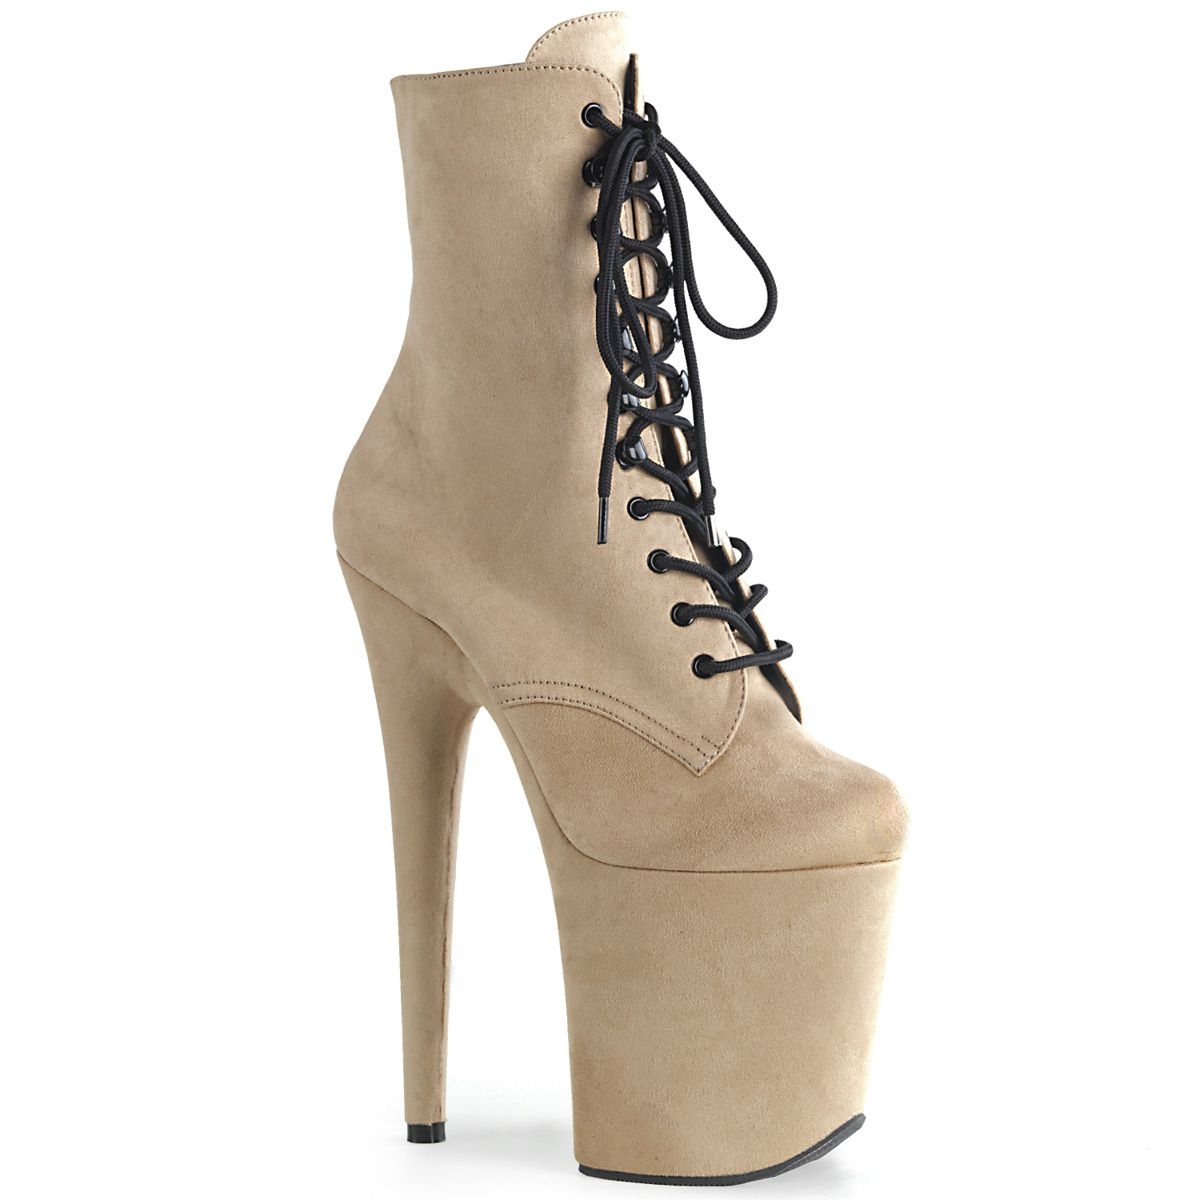 Bota Flamingo 1020 FS Veludo Ankle Boot  - Pleaser (encomenda)